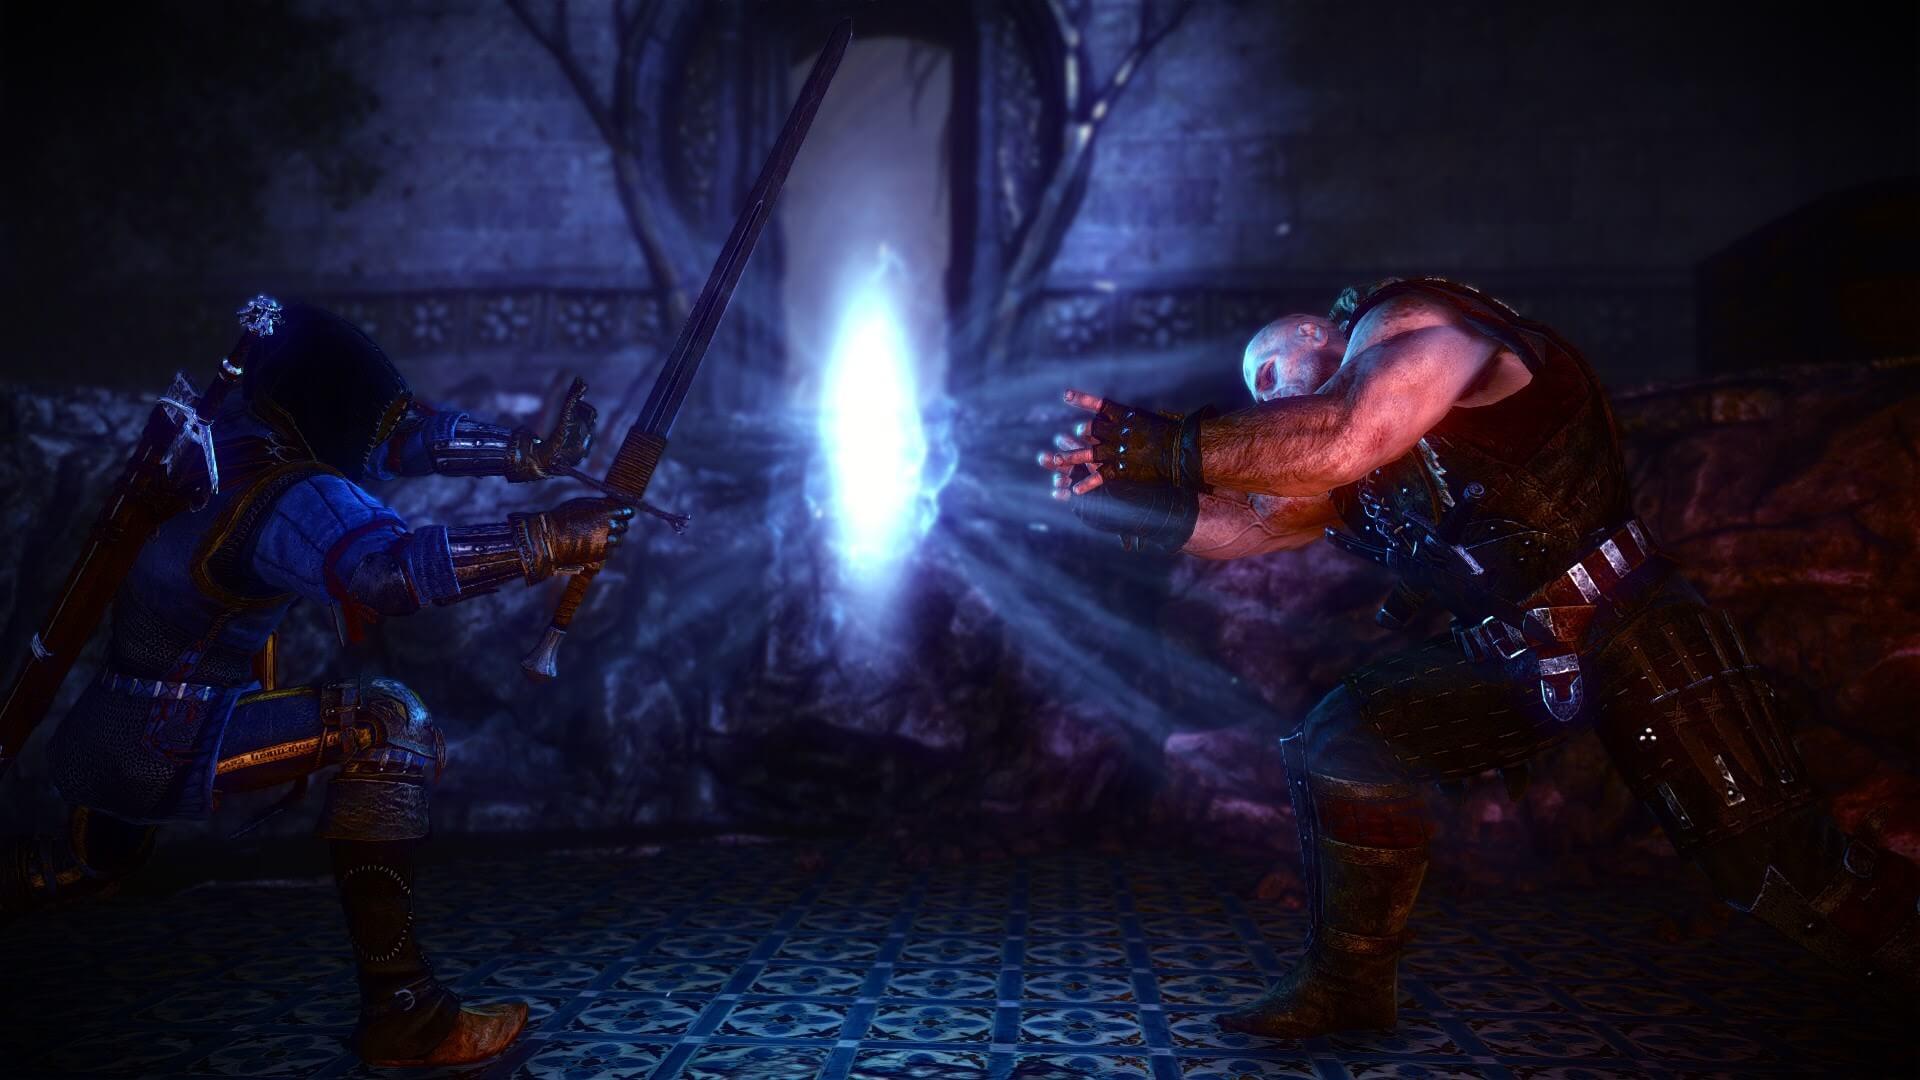 Geralt対レソ。『ウィッチャー2 王の暗殺者』より。